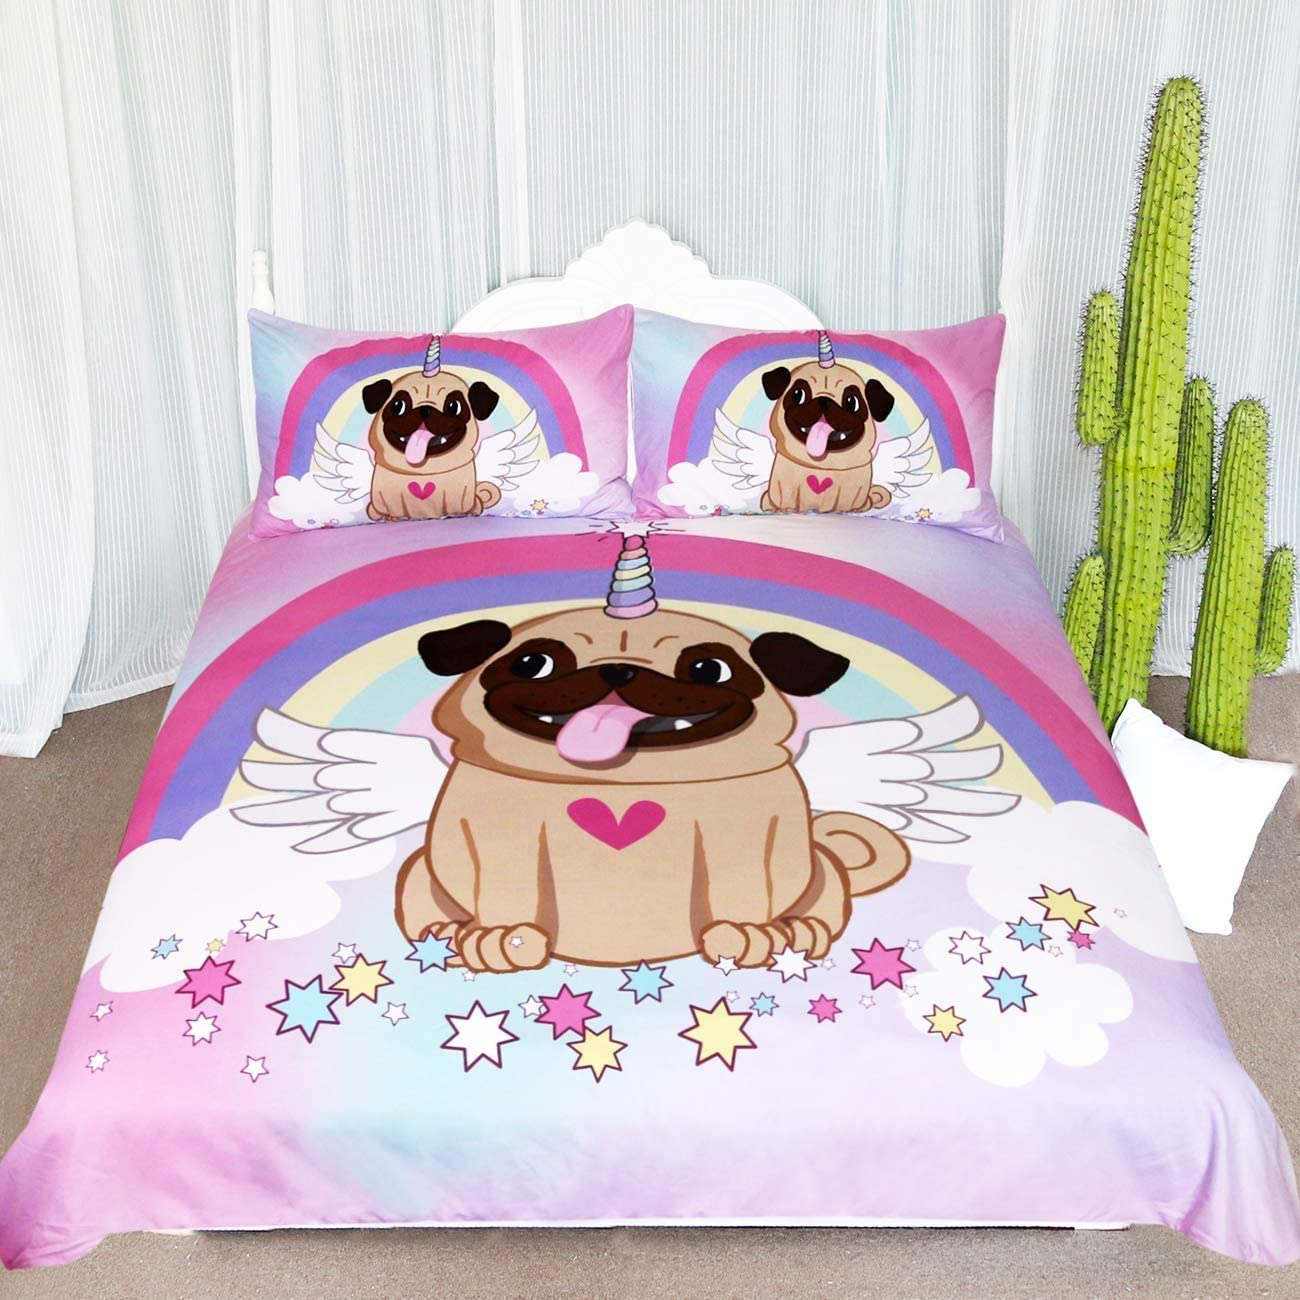 Max 42% OFF ARIGHTEX Unicorn Pug Bedding Twin Pi for Fresno Mall Girls 3